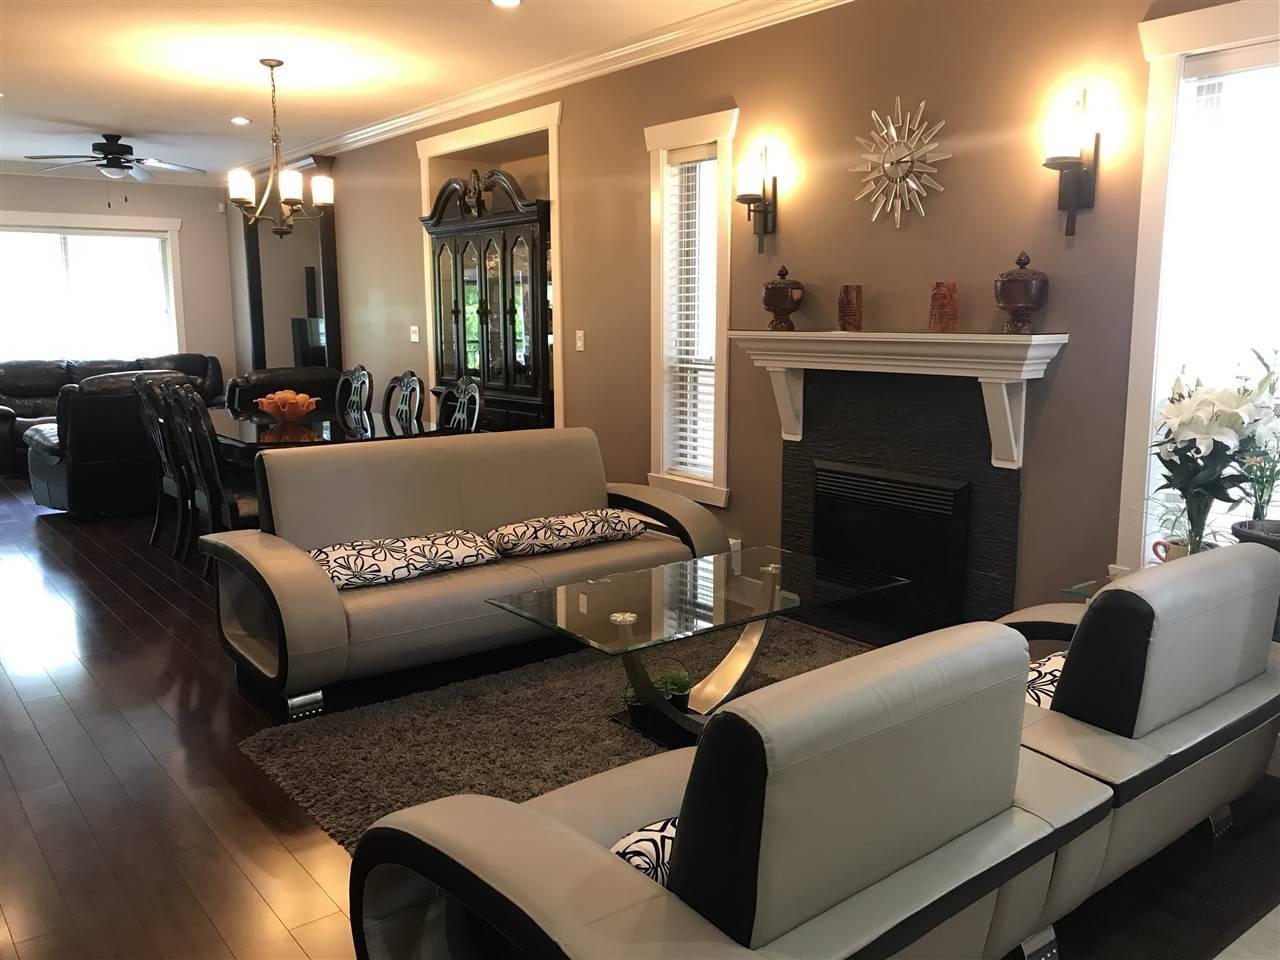 Buliding: 15168 66a Avenue, Surrey, BC